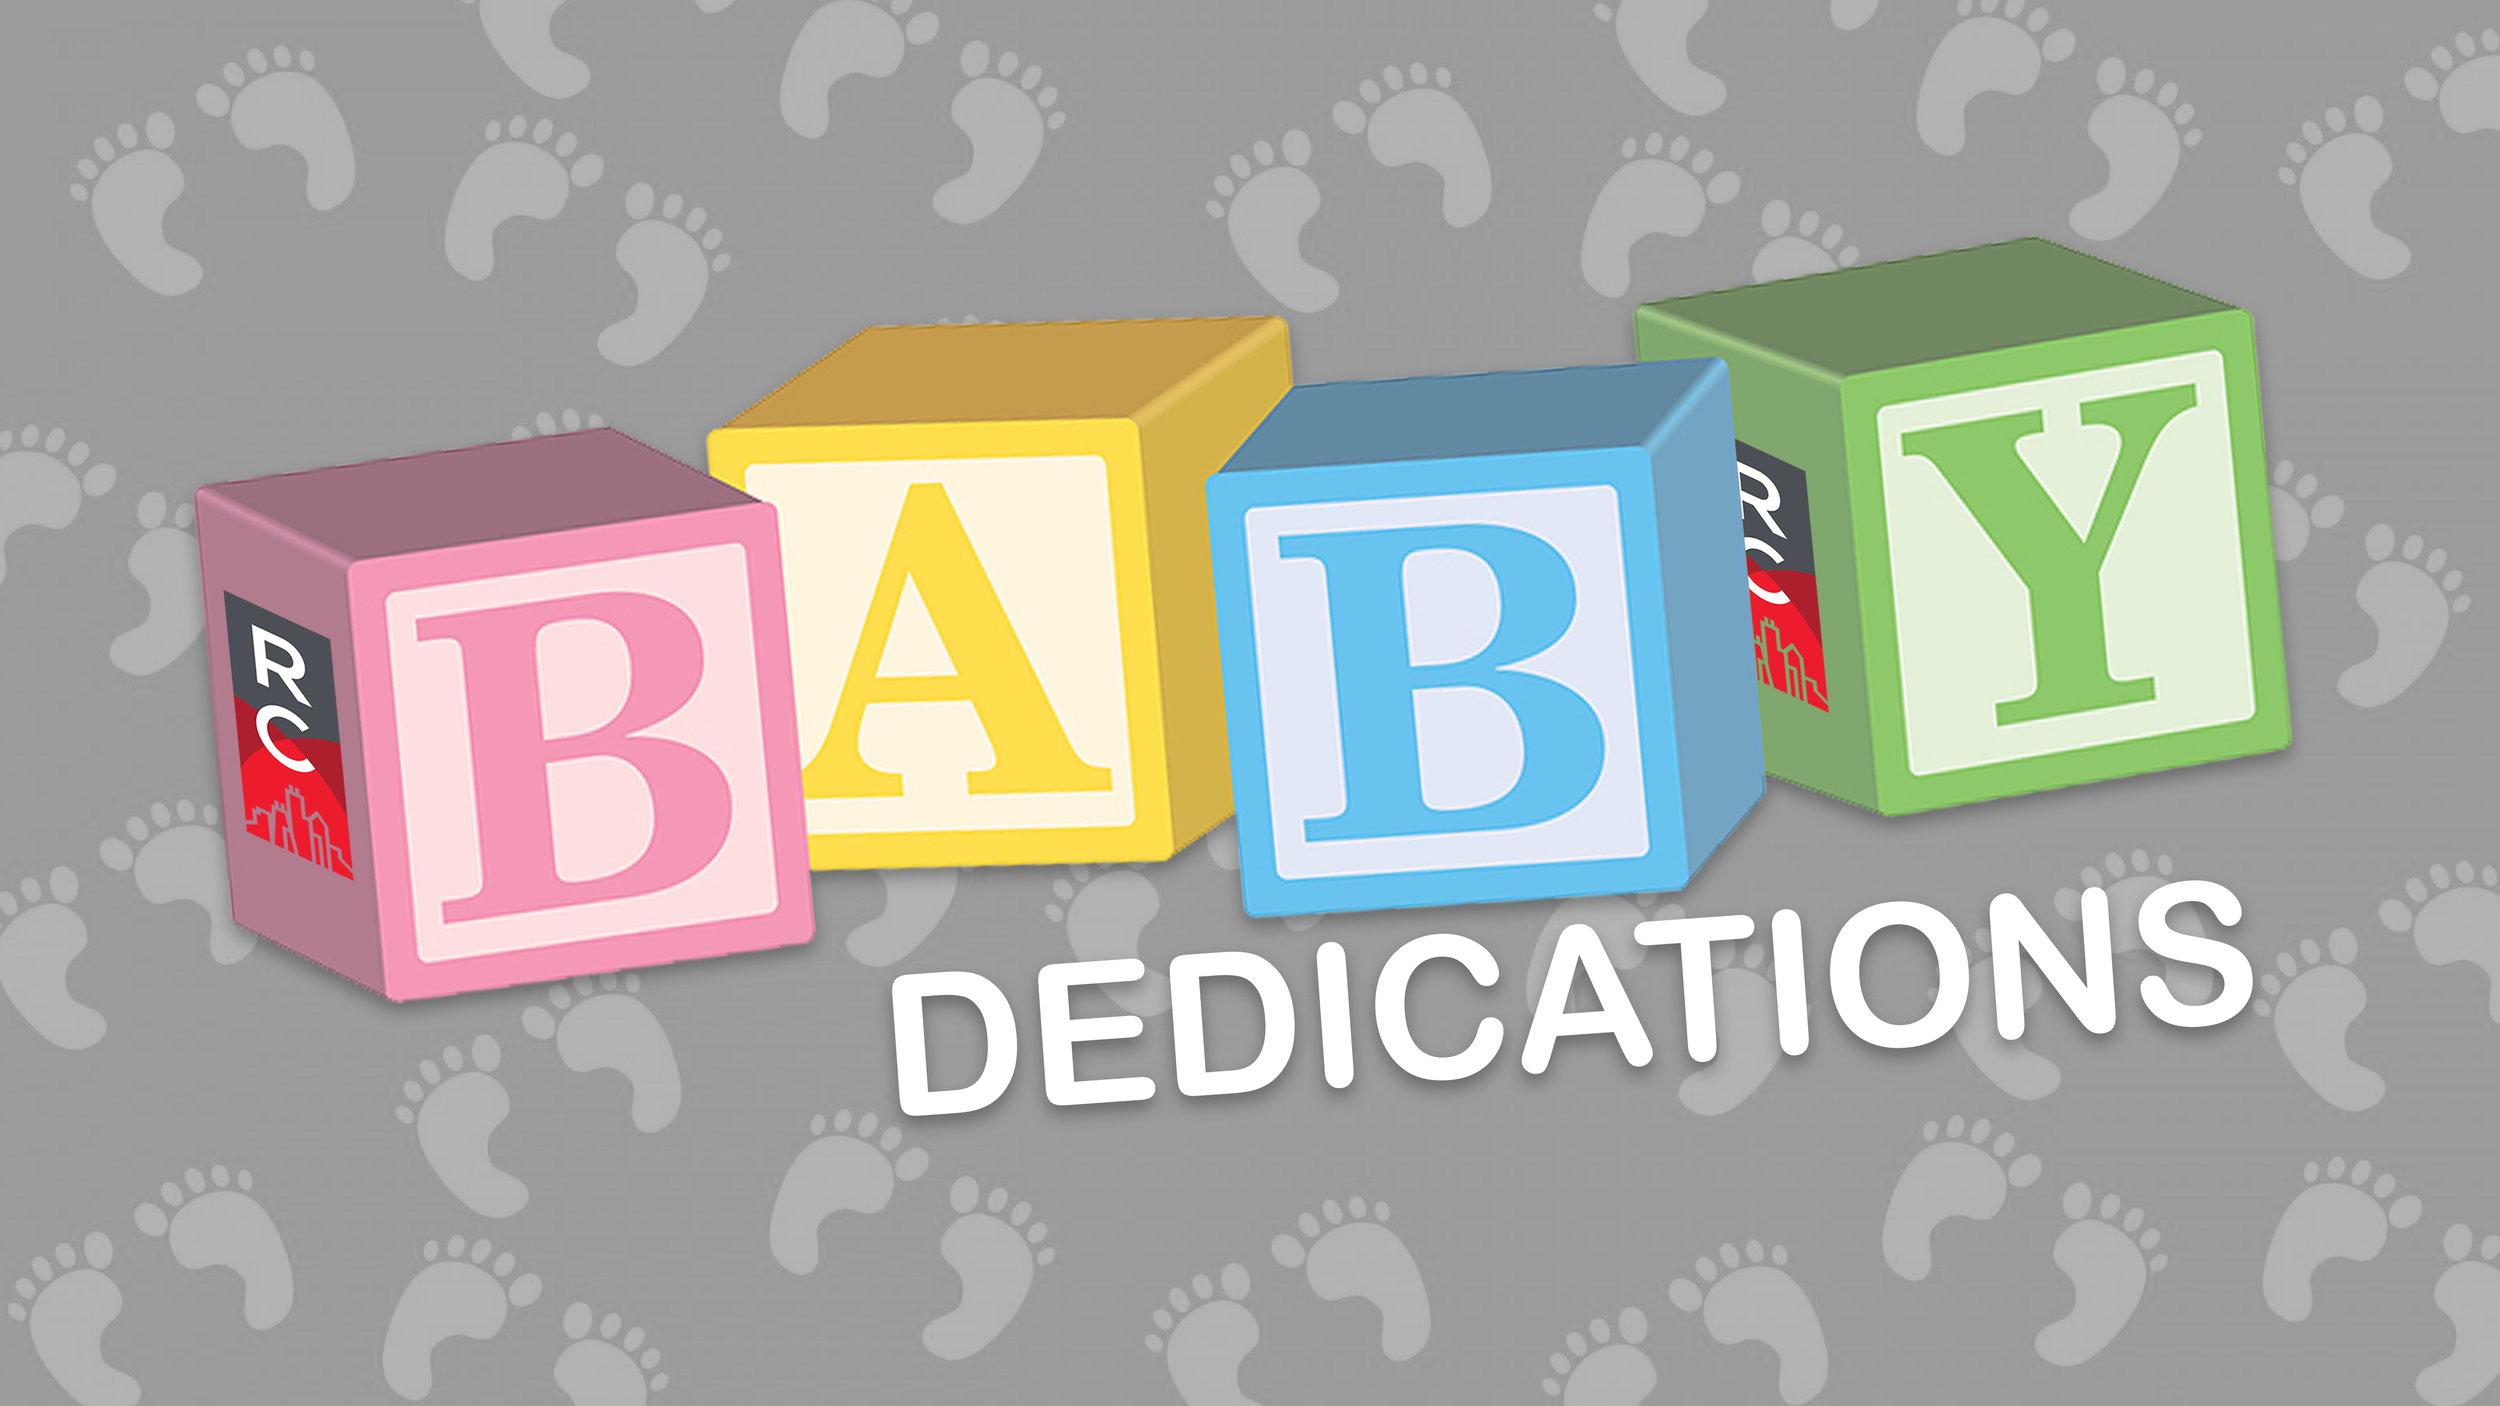 RCC Baby Dedication.jpg